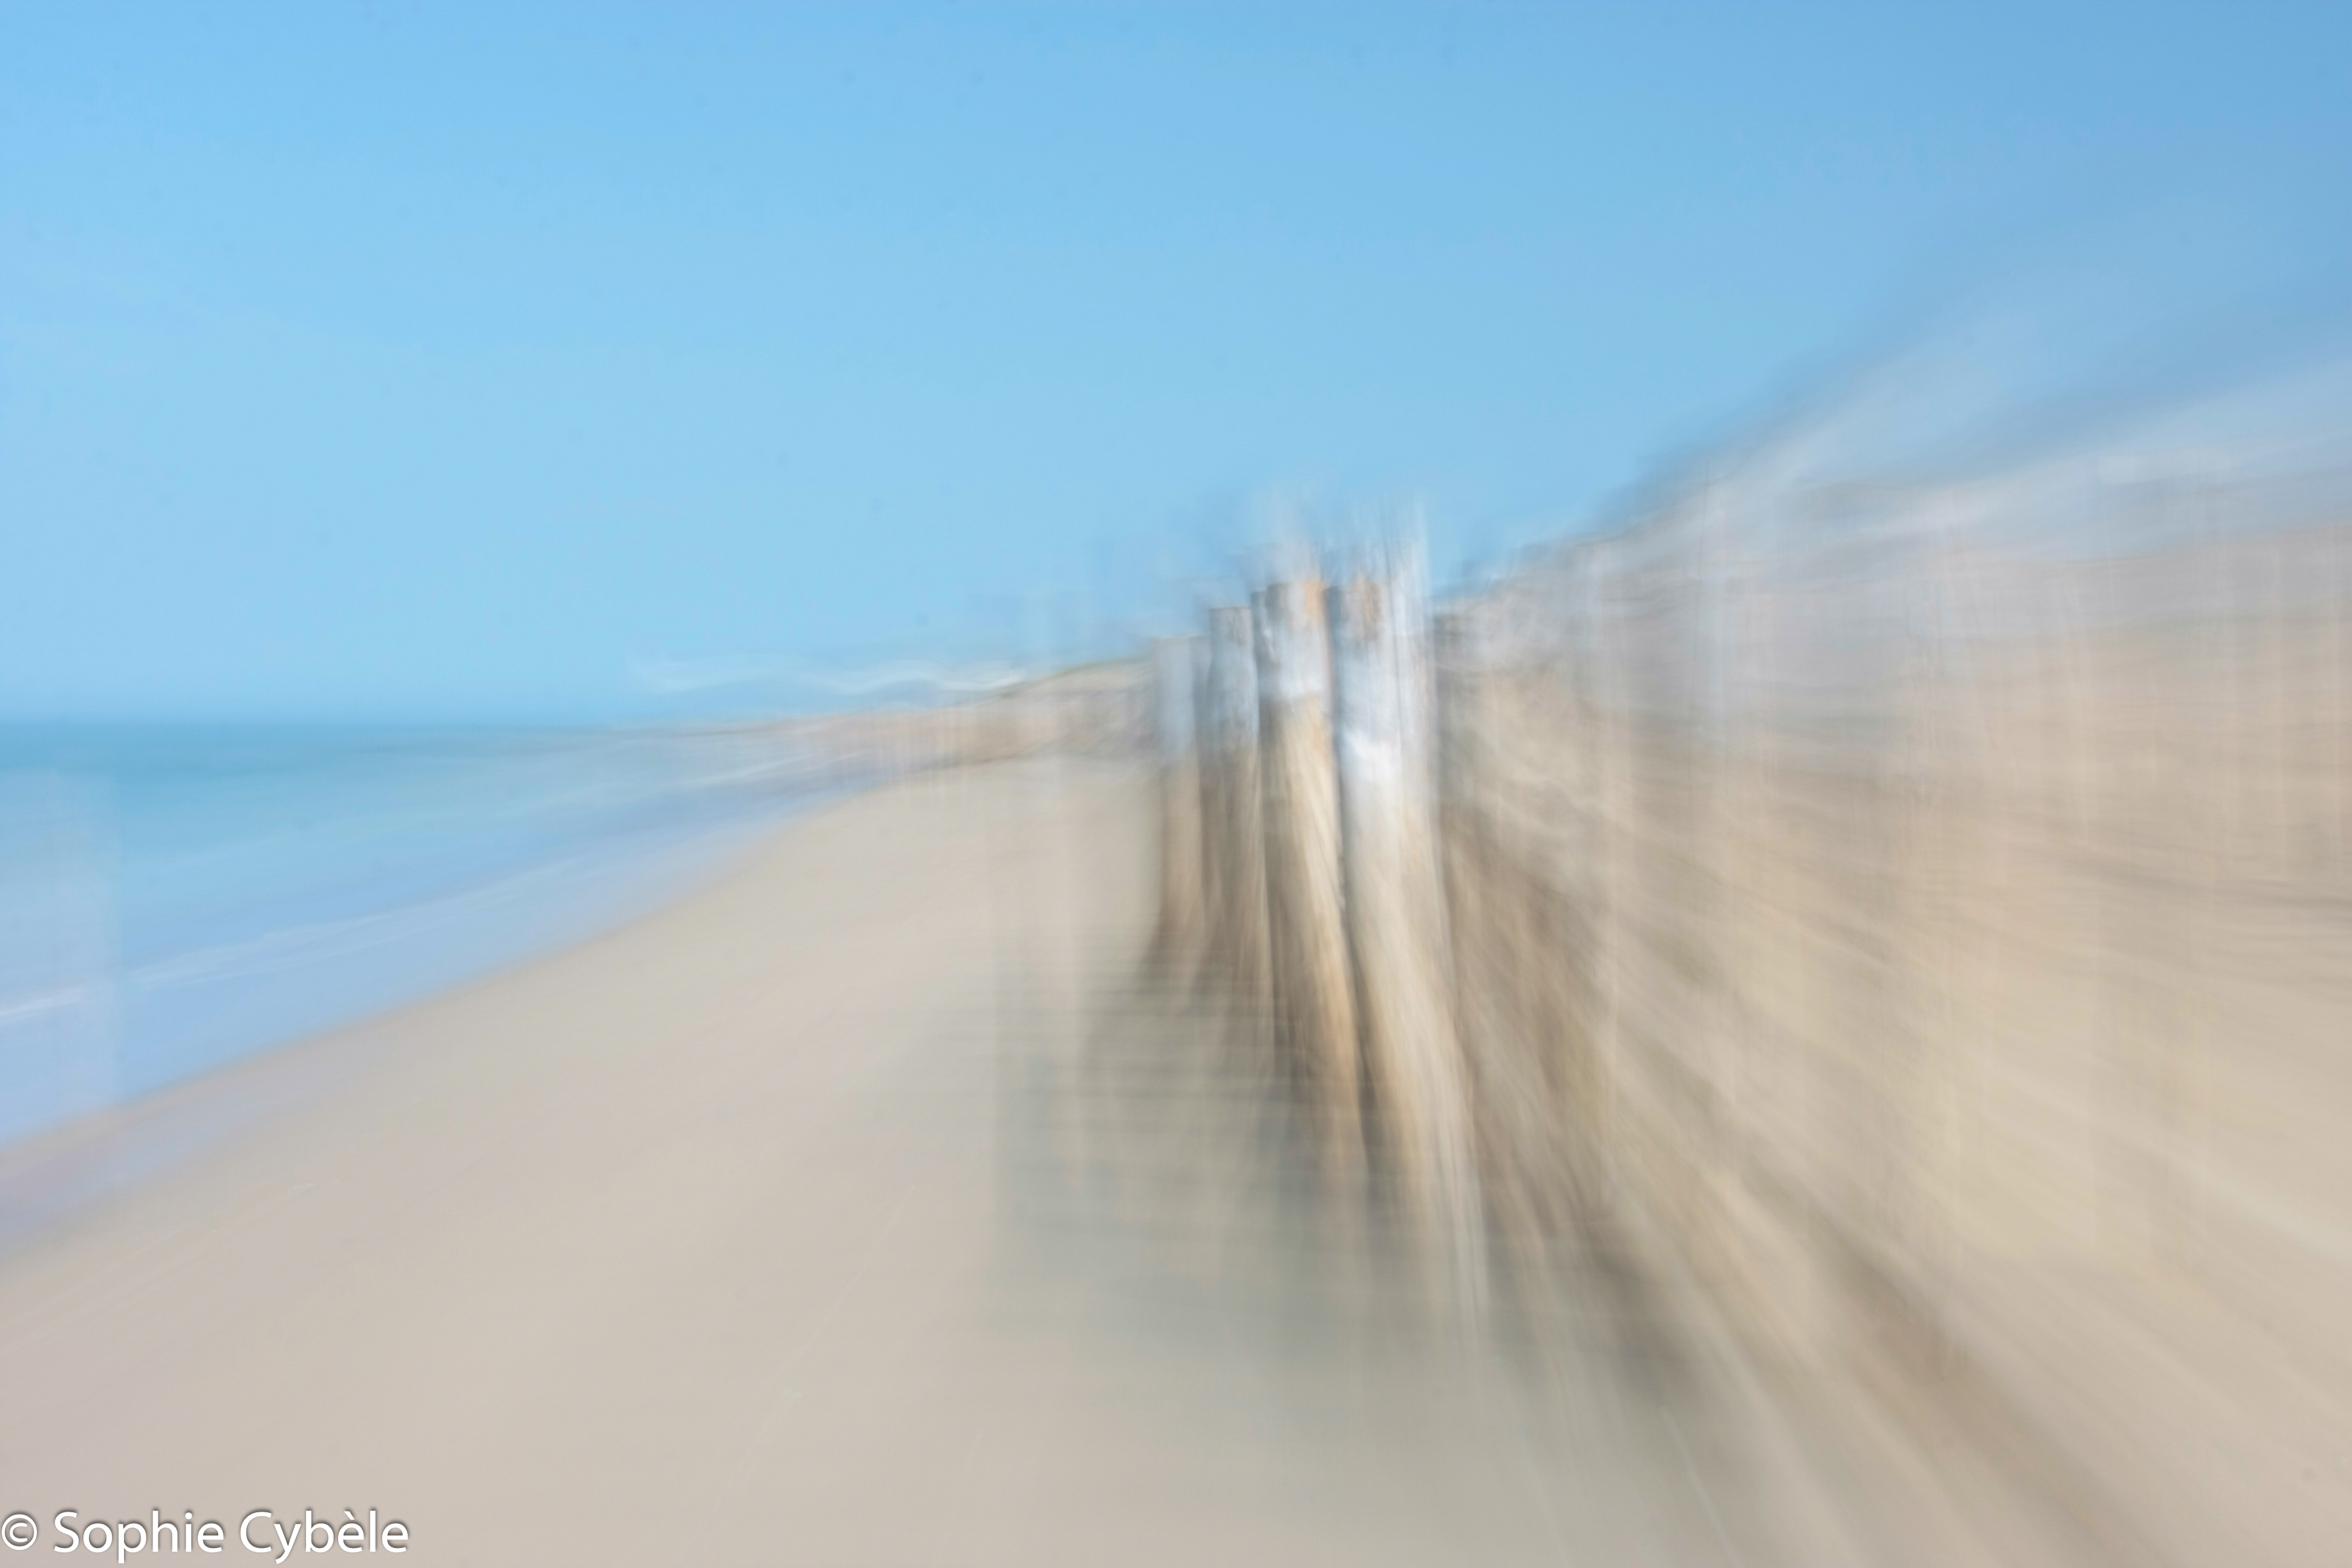 Pieux et dunes